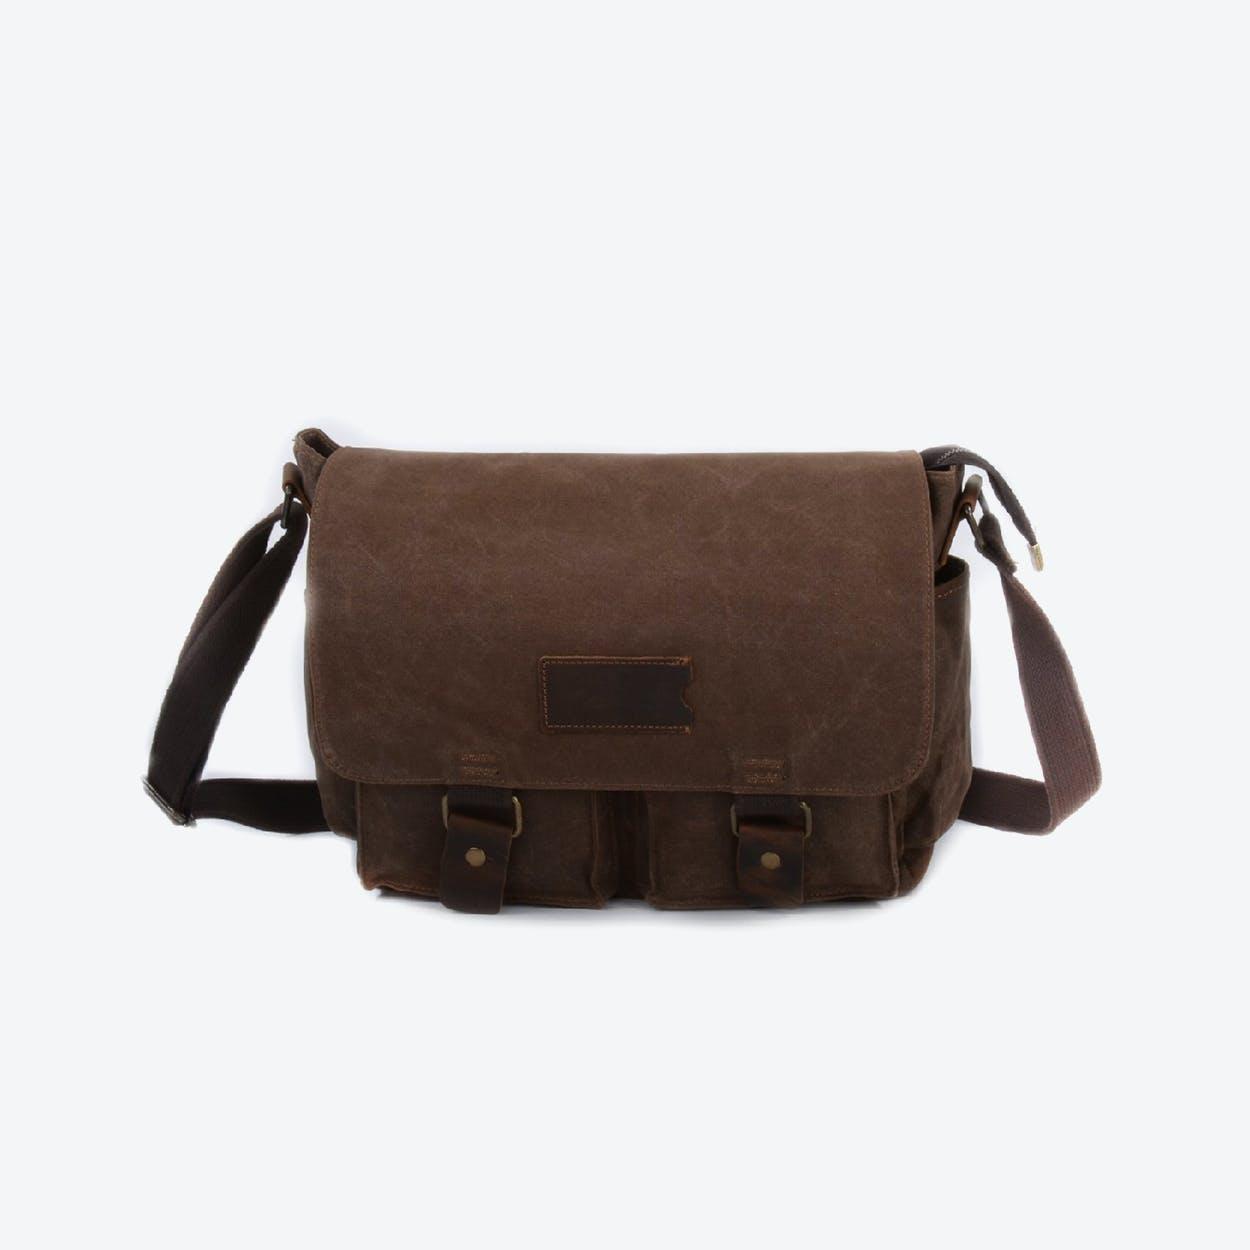 Waxed Canvas Water Repellent Postman Shoulder Bag in Brown